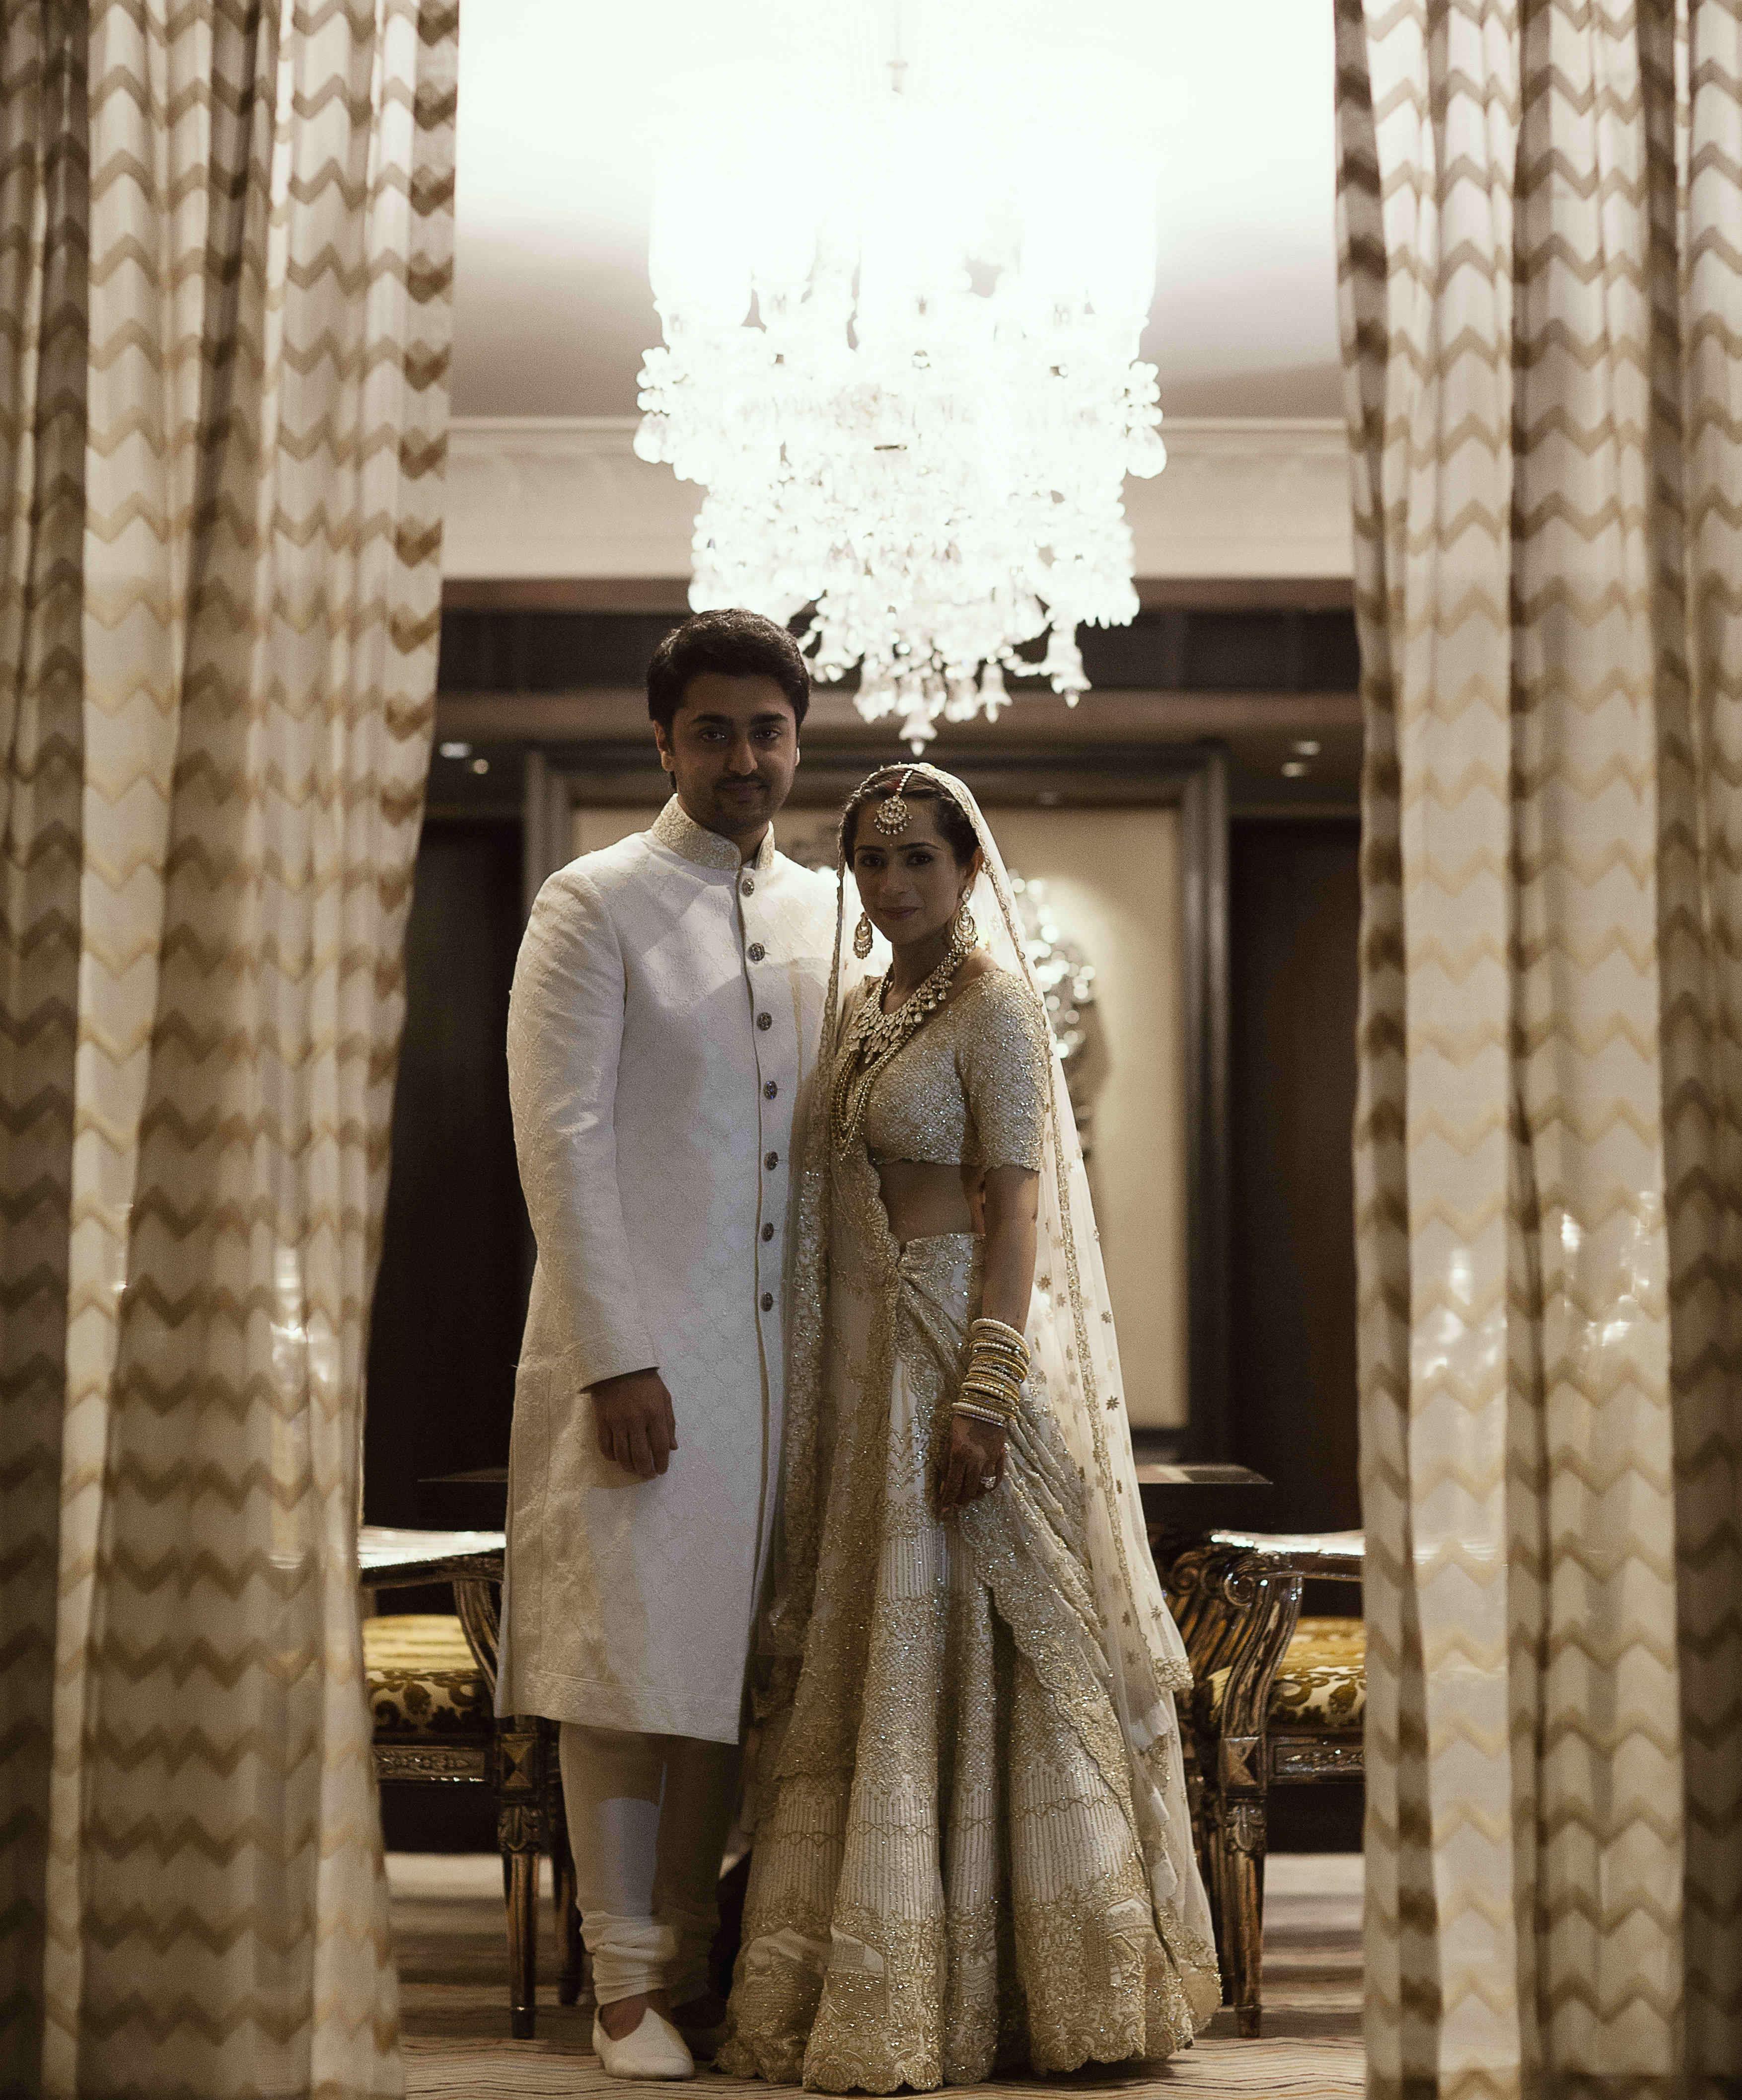 royal wedding outfit:tribhovandas bhimji zaveri ltd., namrata soni makup artist